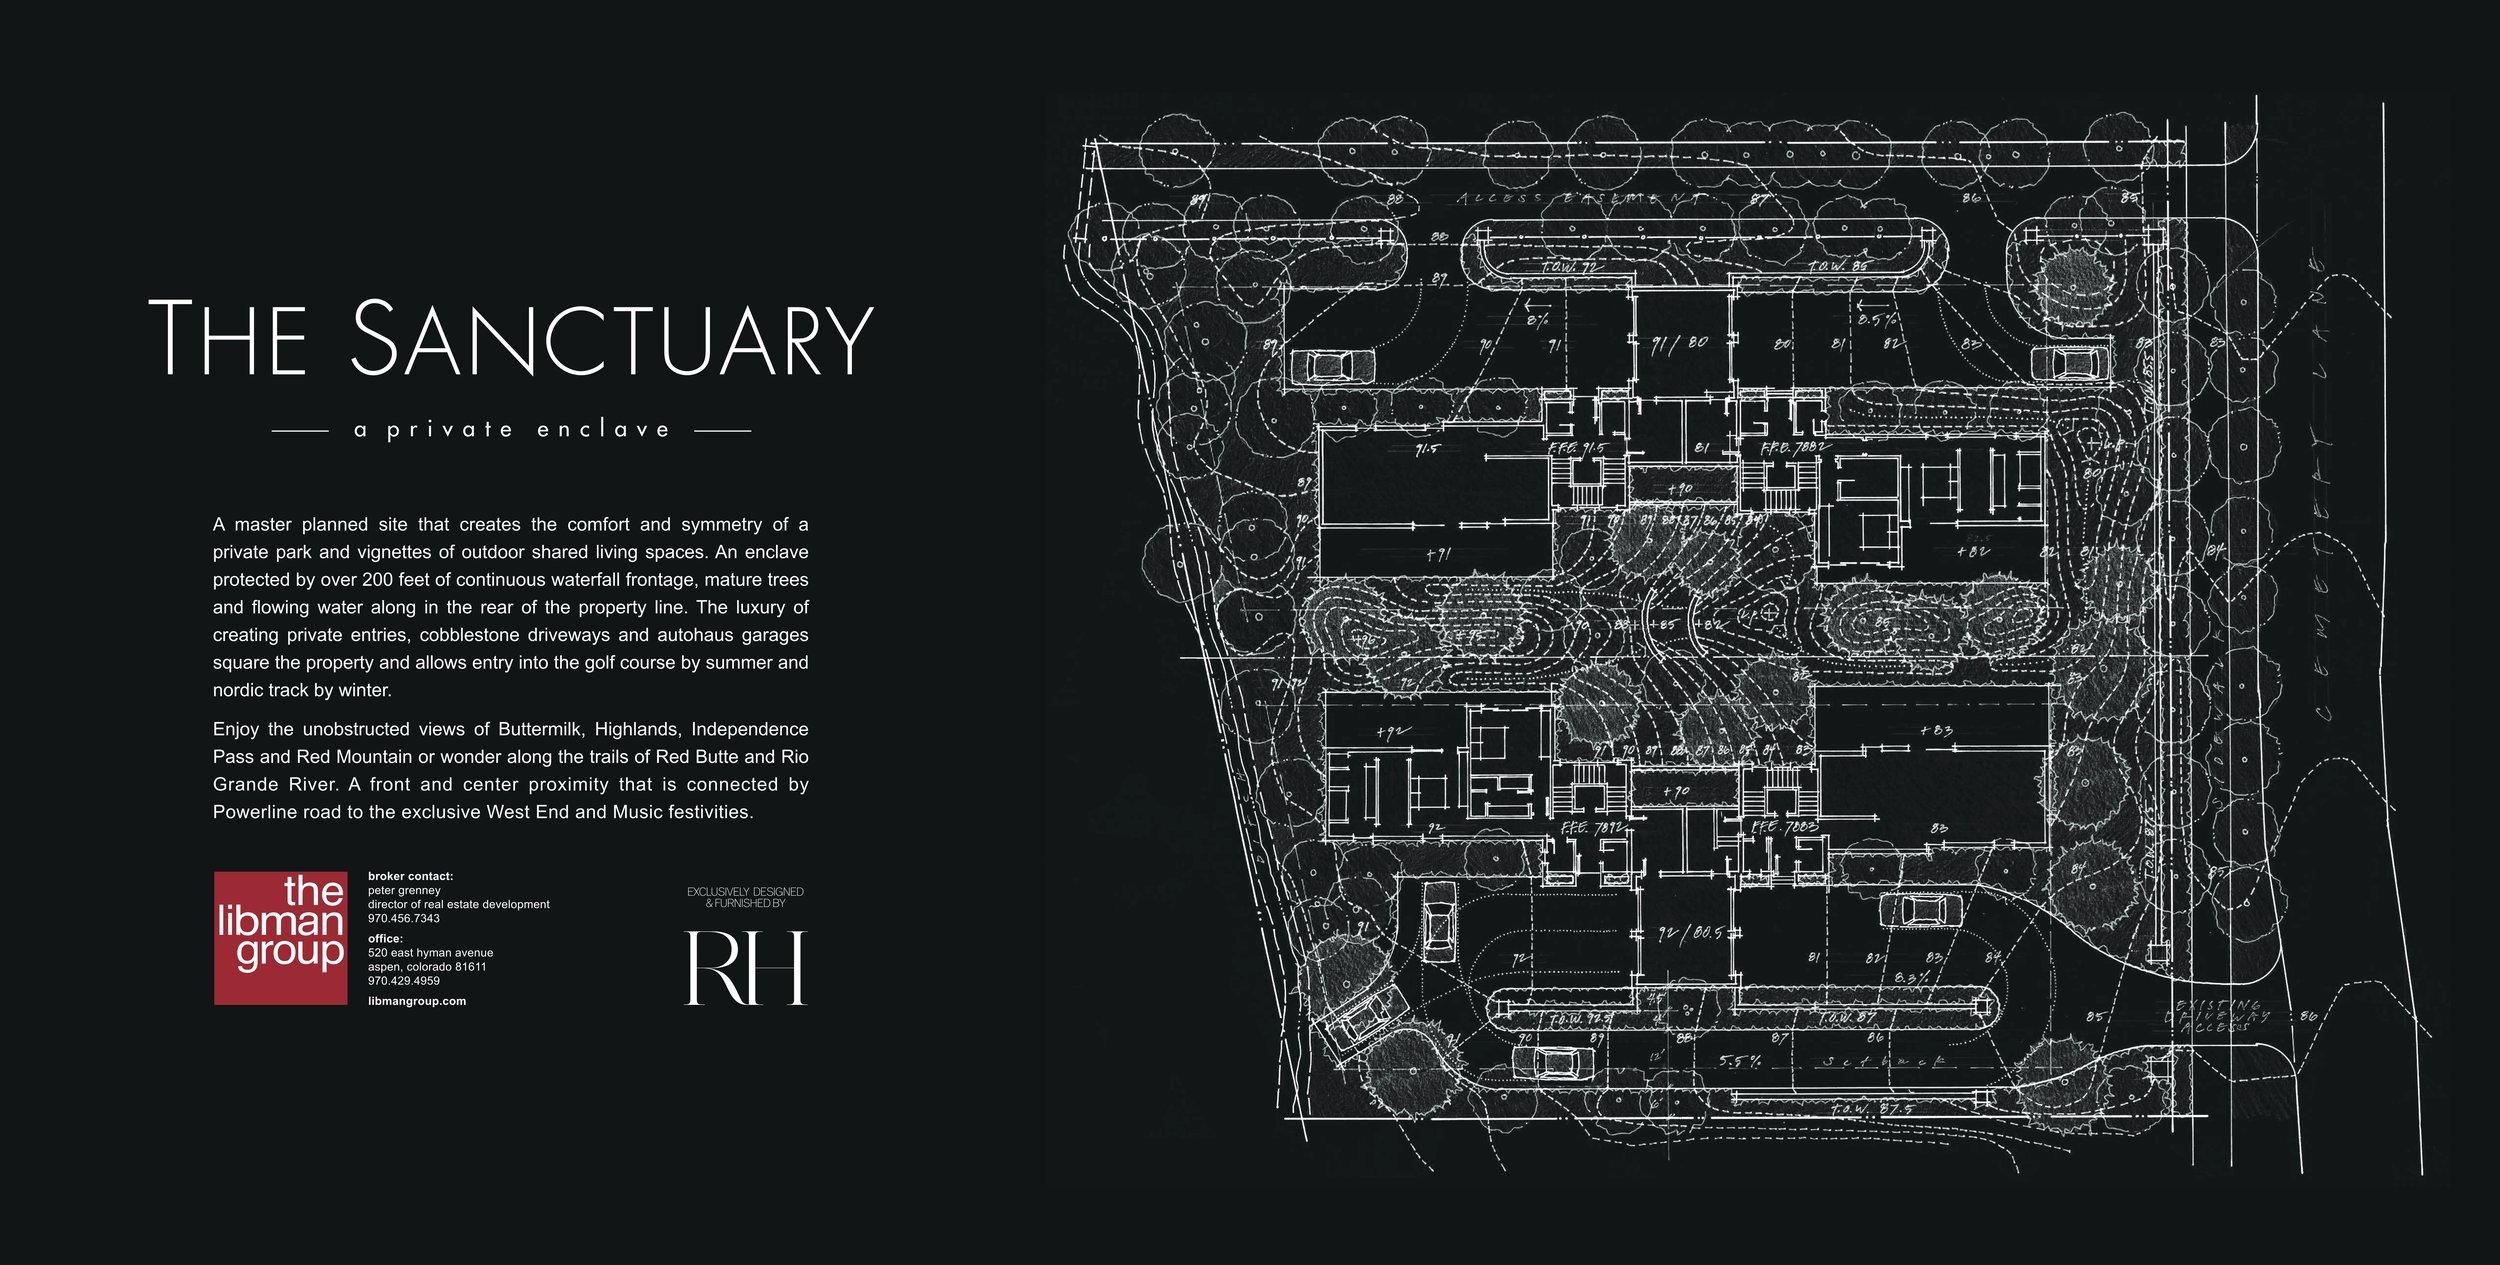 real estate development the sanctuary libman group.jpg